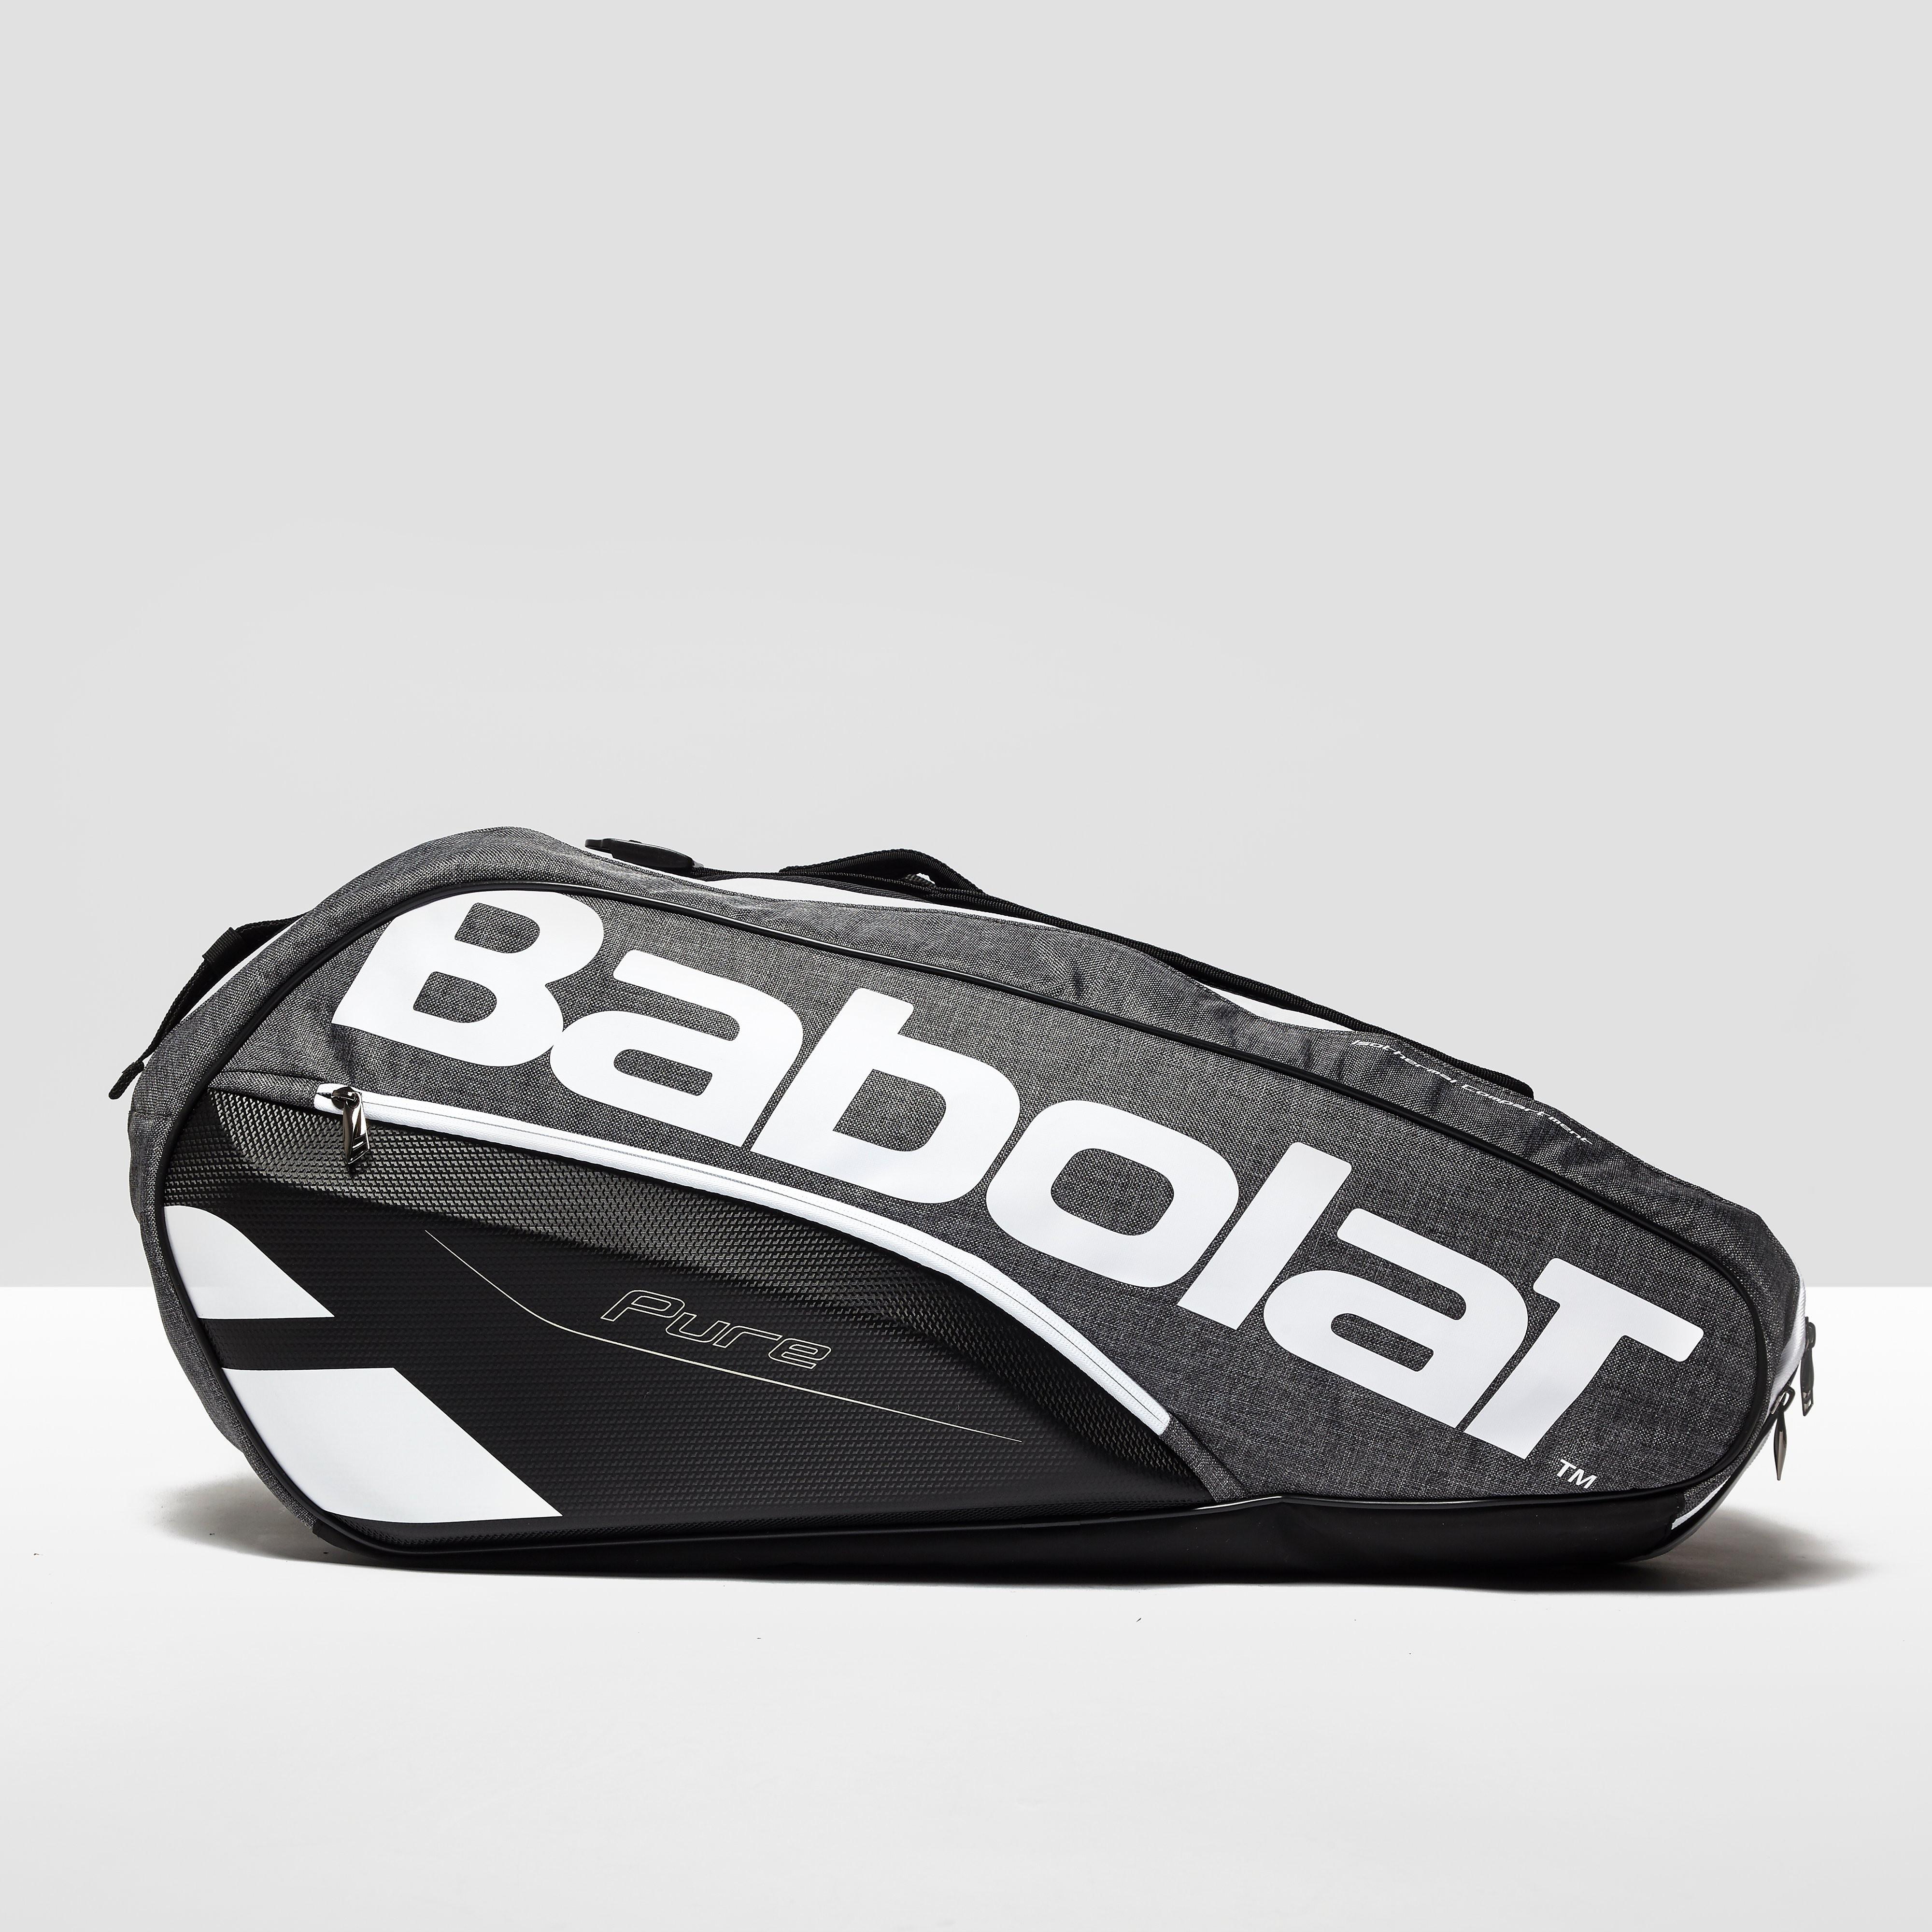 Babolat RH9 Pure Racket Bag